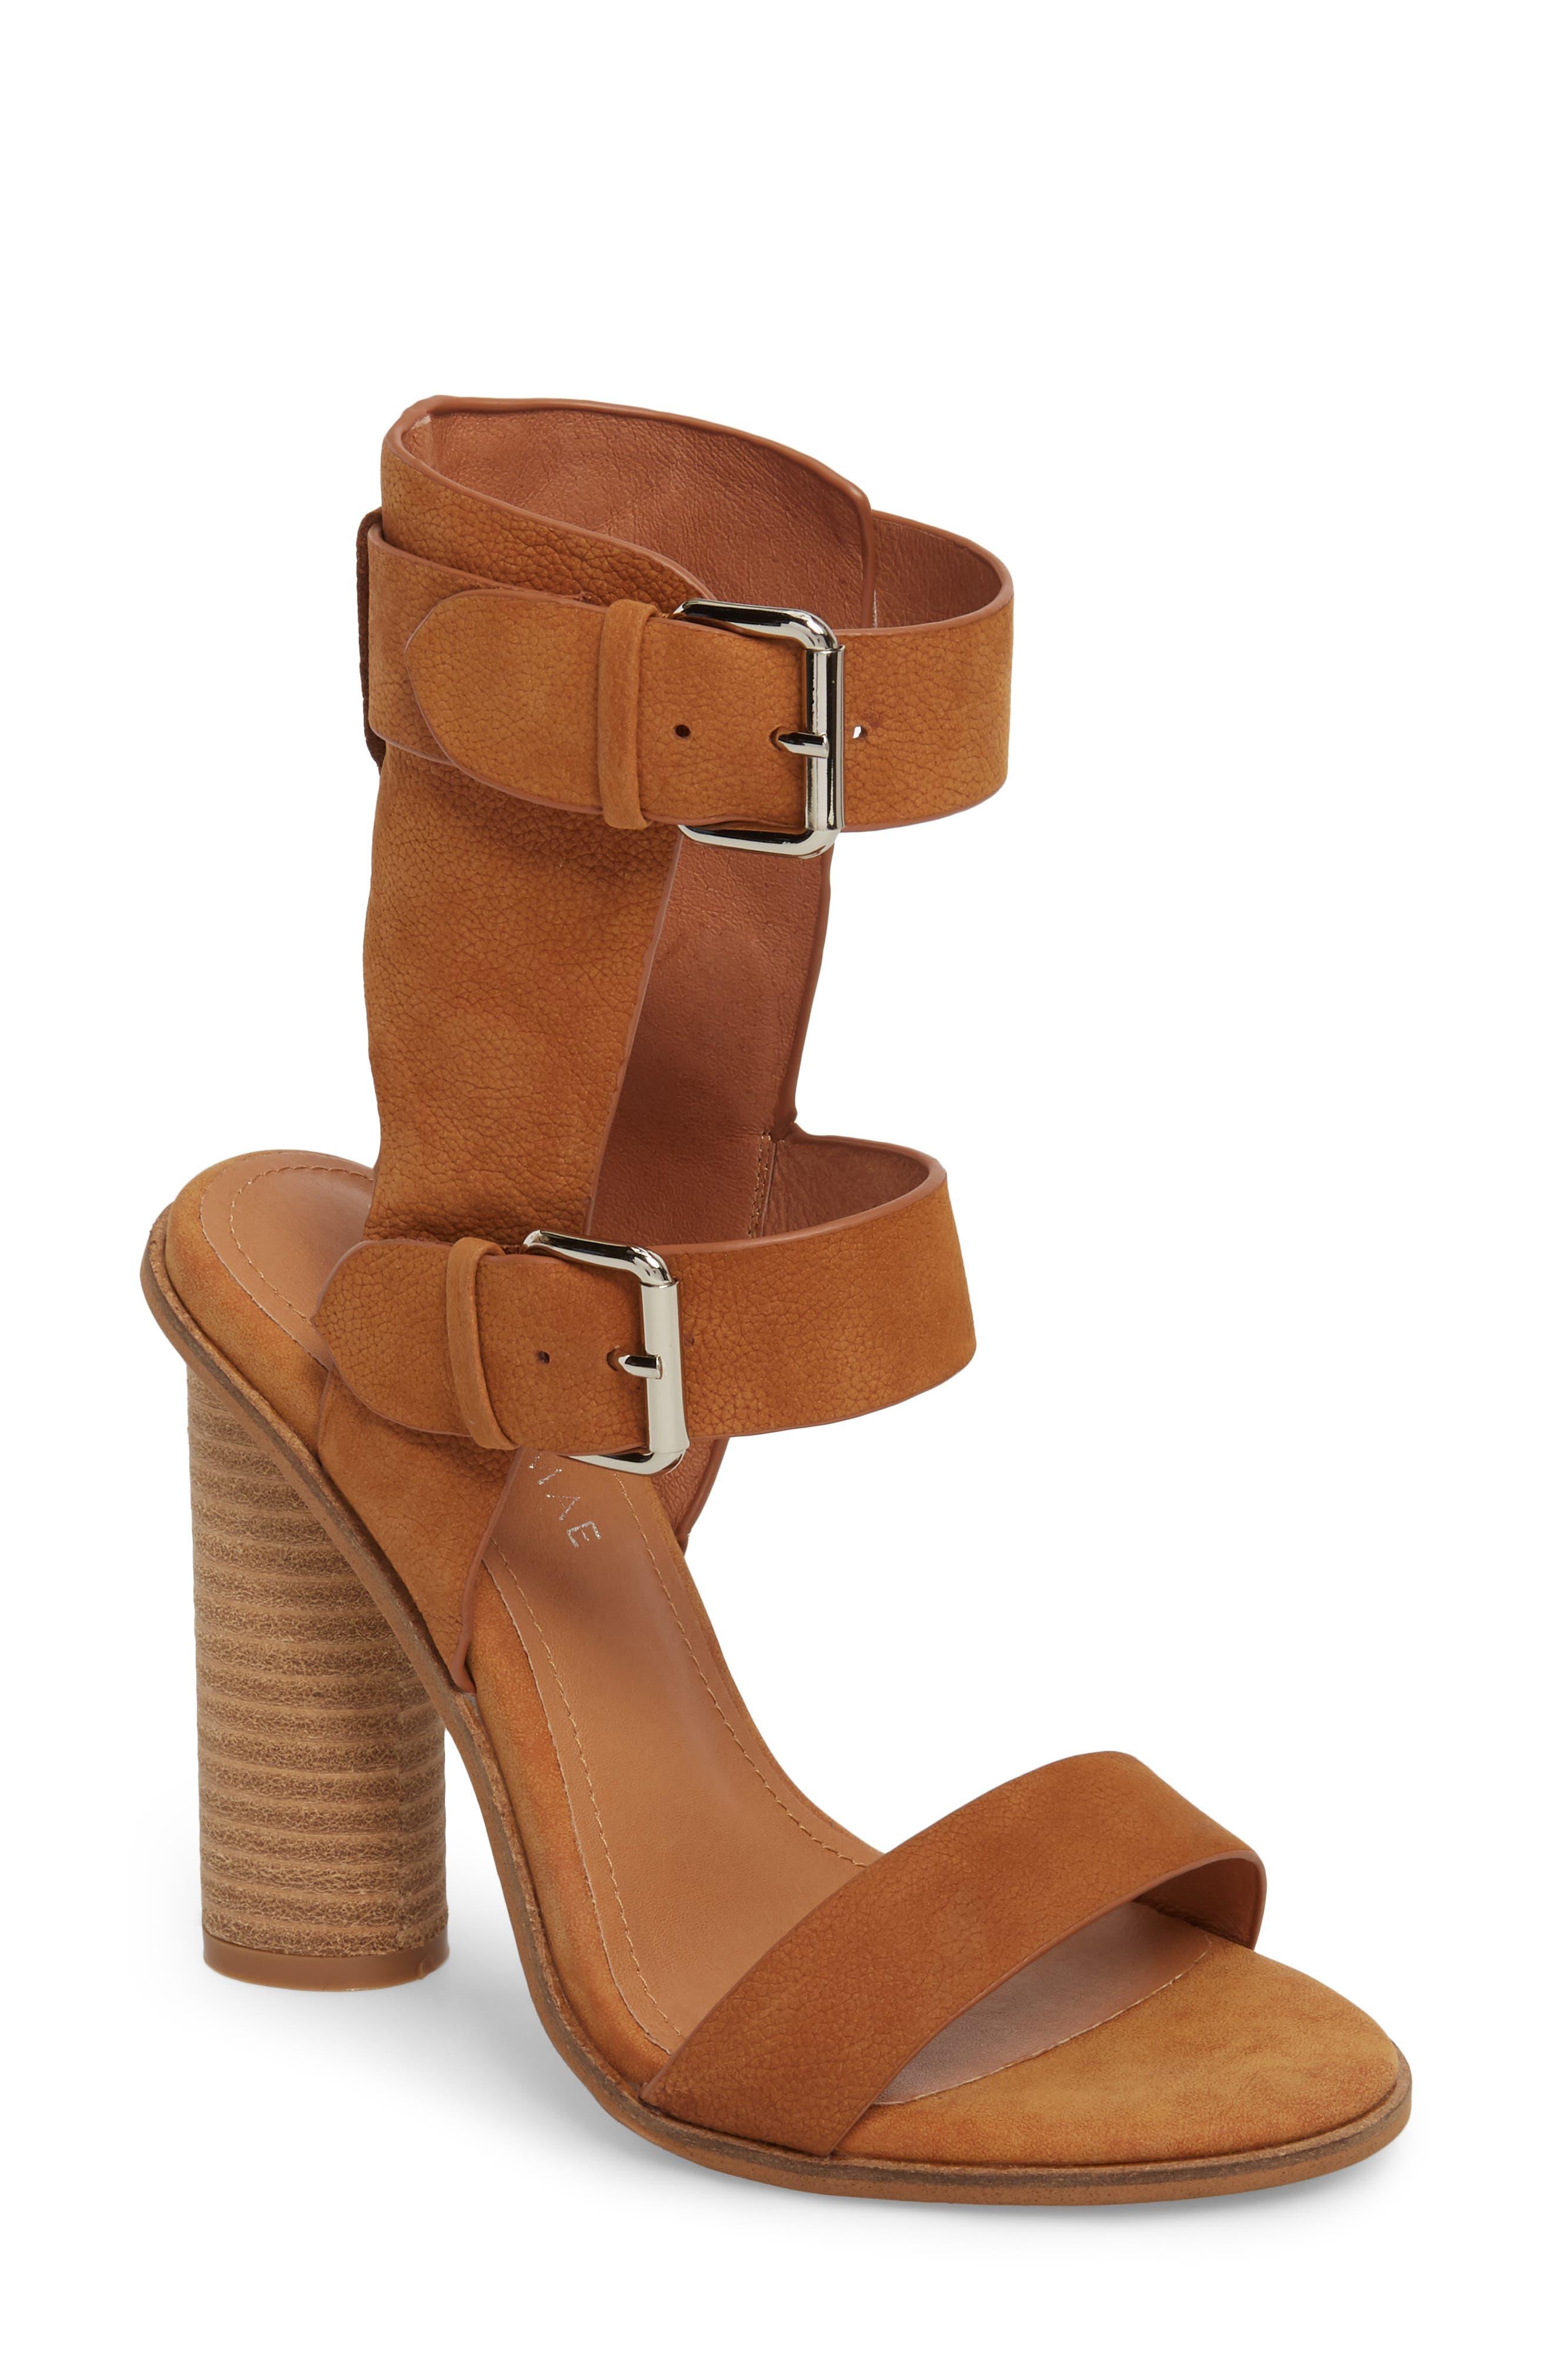 Abeba Block Heel Sandal,                             Main thumbnail 1, color,                             Tan Leather